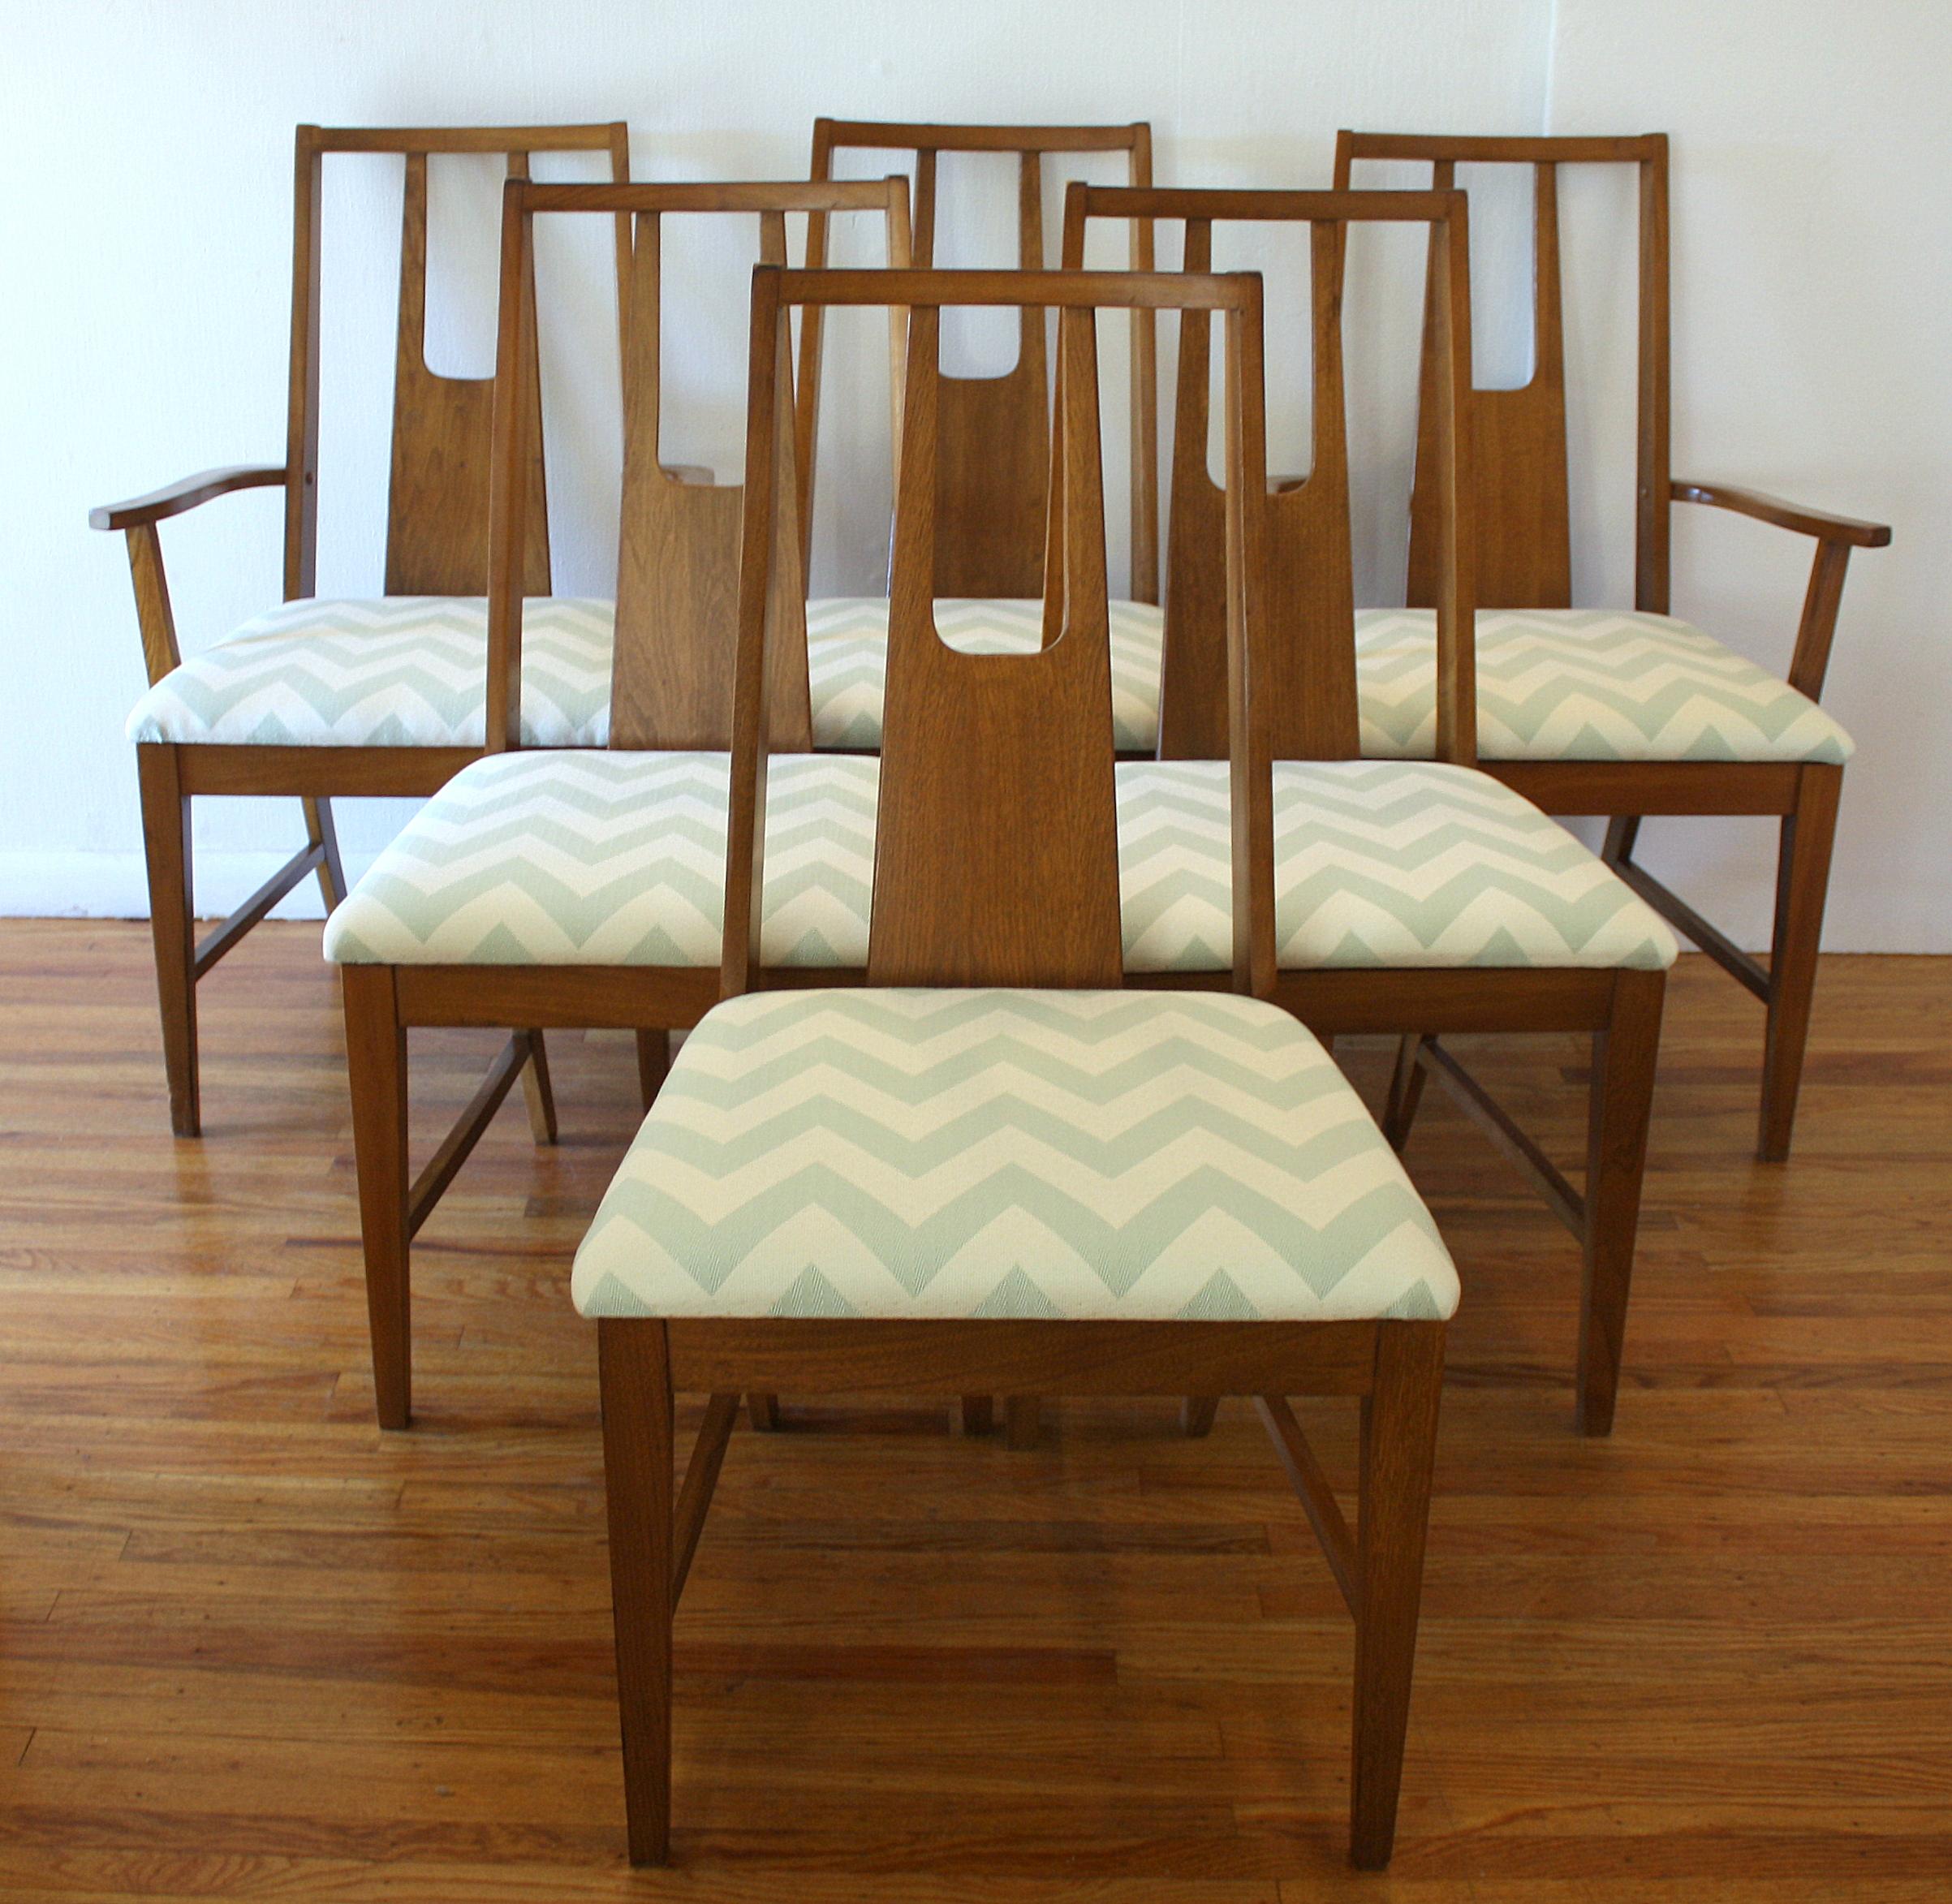 mcm-aqua-chevron-chairs-1